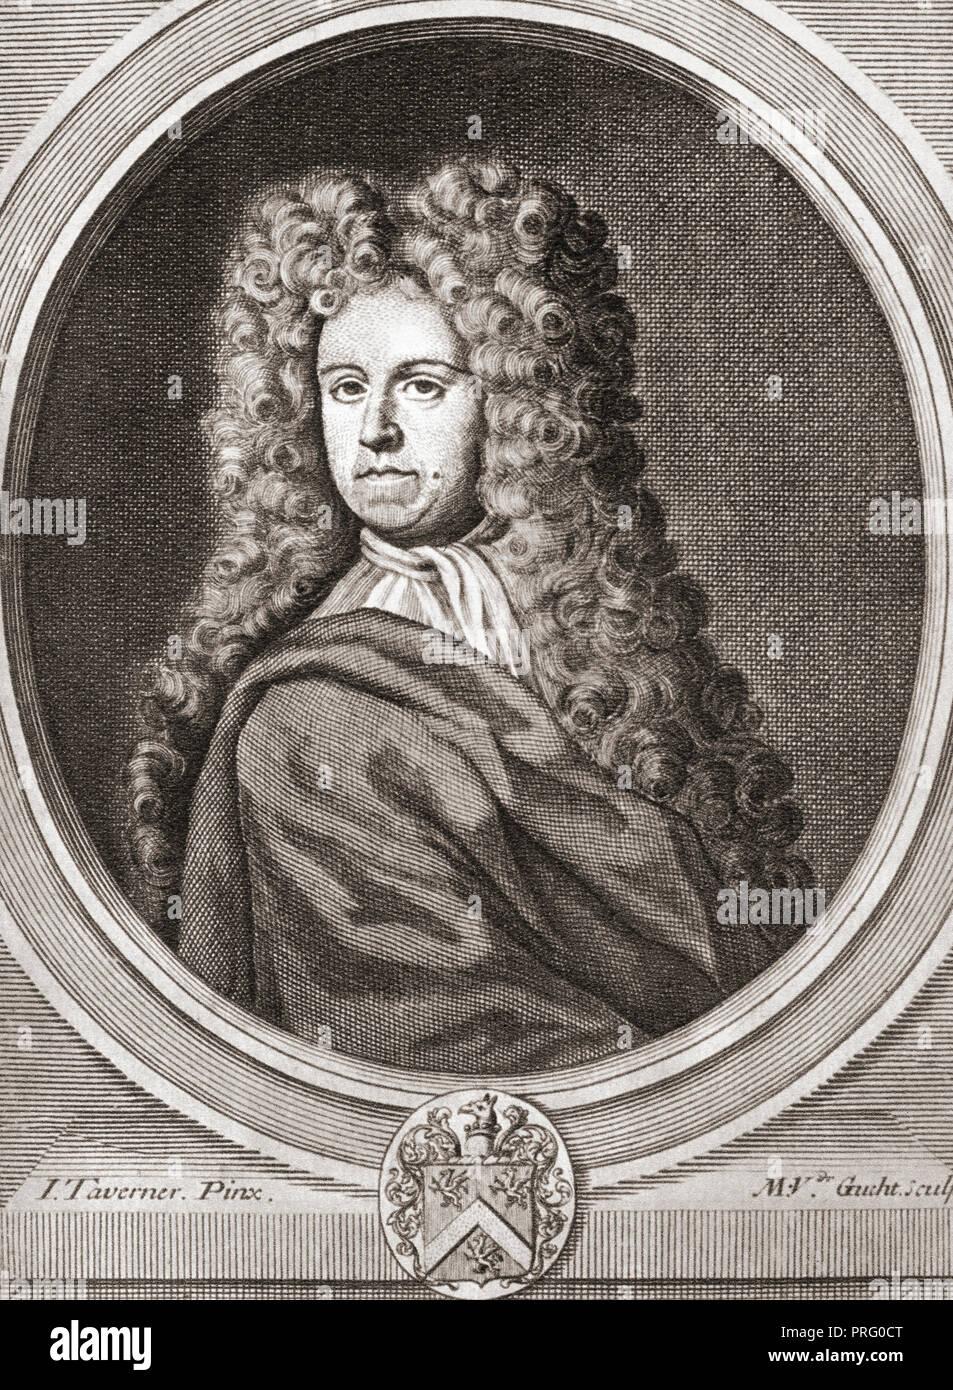 Daniel Defoe, 1660 - 1731, born Daniel Foe.  English trader, writer, journalist, pamphleteer and spy. Stock Photo